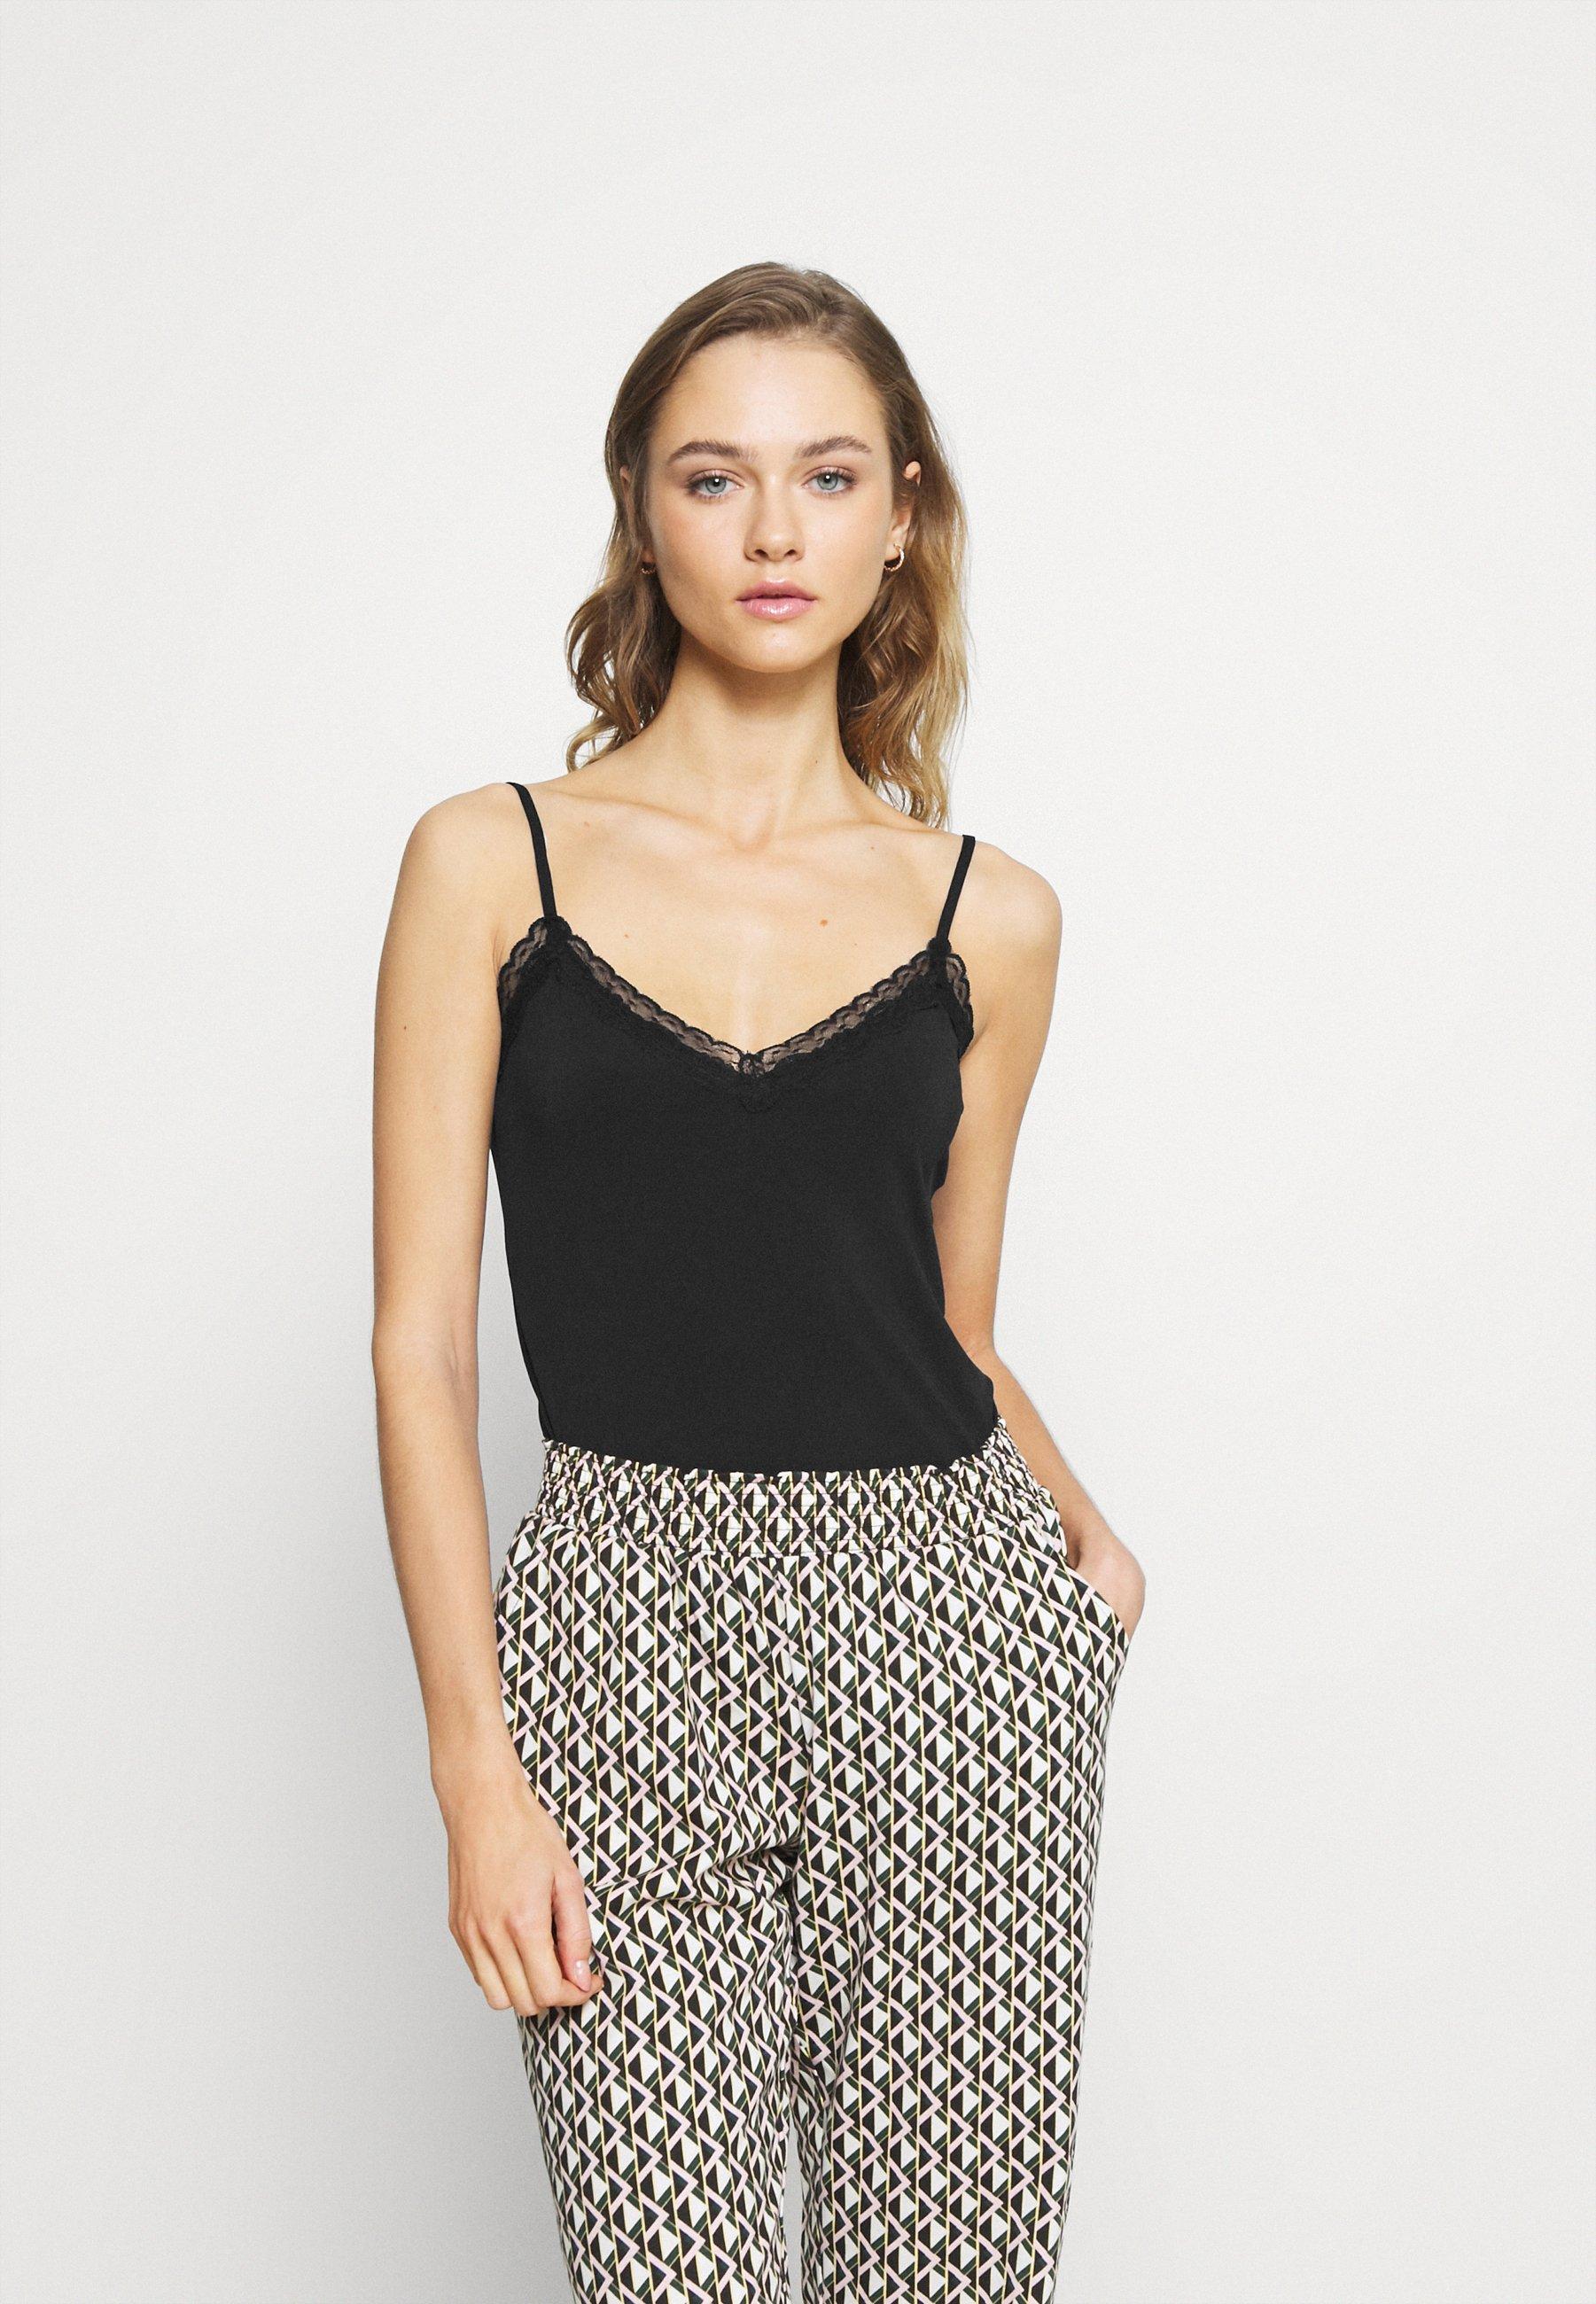 Damen PCKATE LACE SINGLET - Unterhemd/-shirt